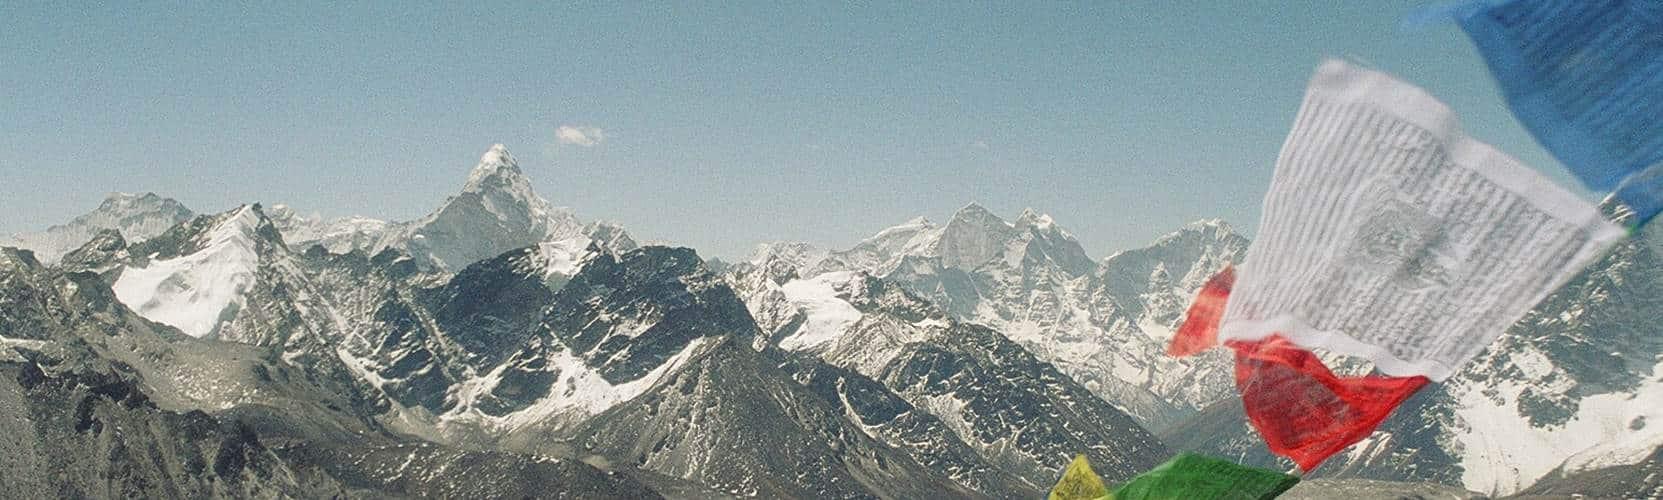 Jiri Everest Trek, 23-day program